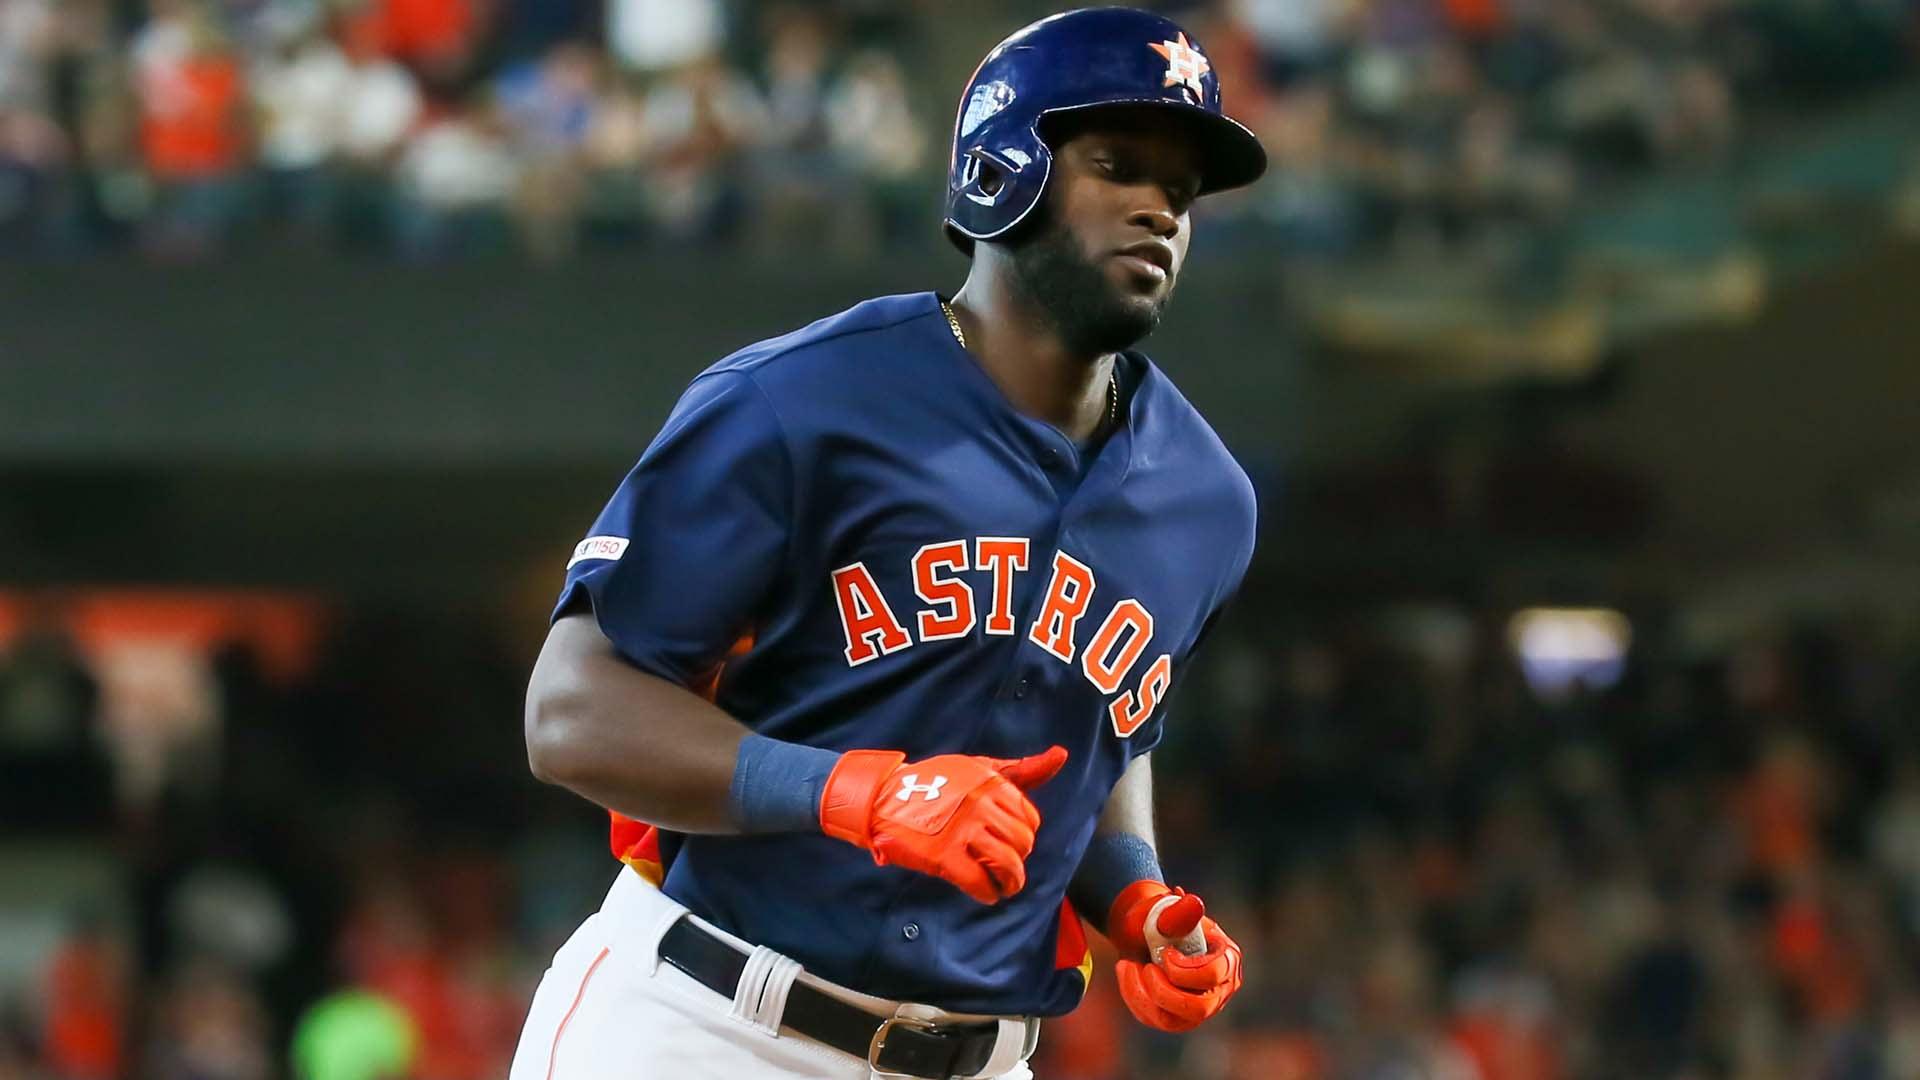 Fantasy baseball stock watch - Astros' Yordan Alvarez is swinging for the fences